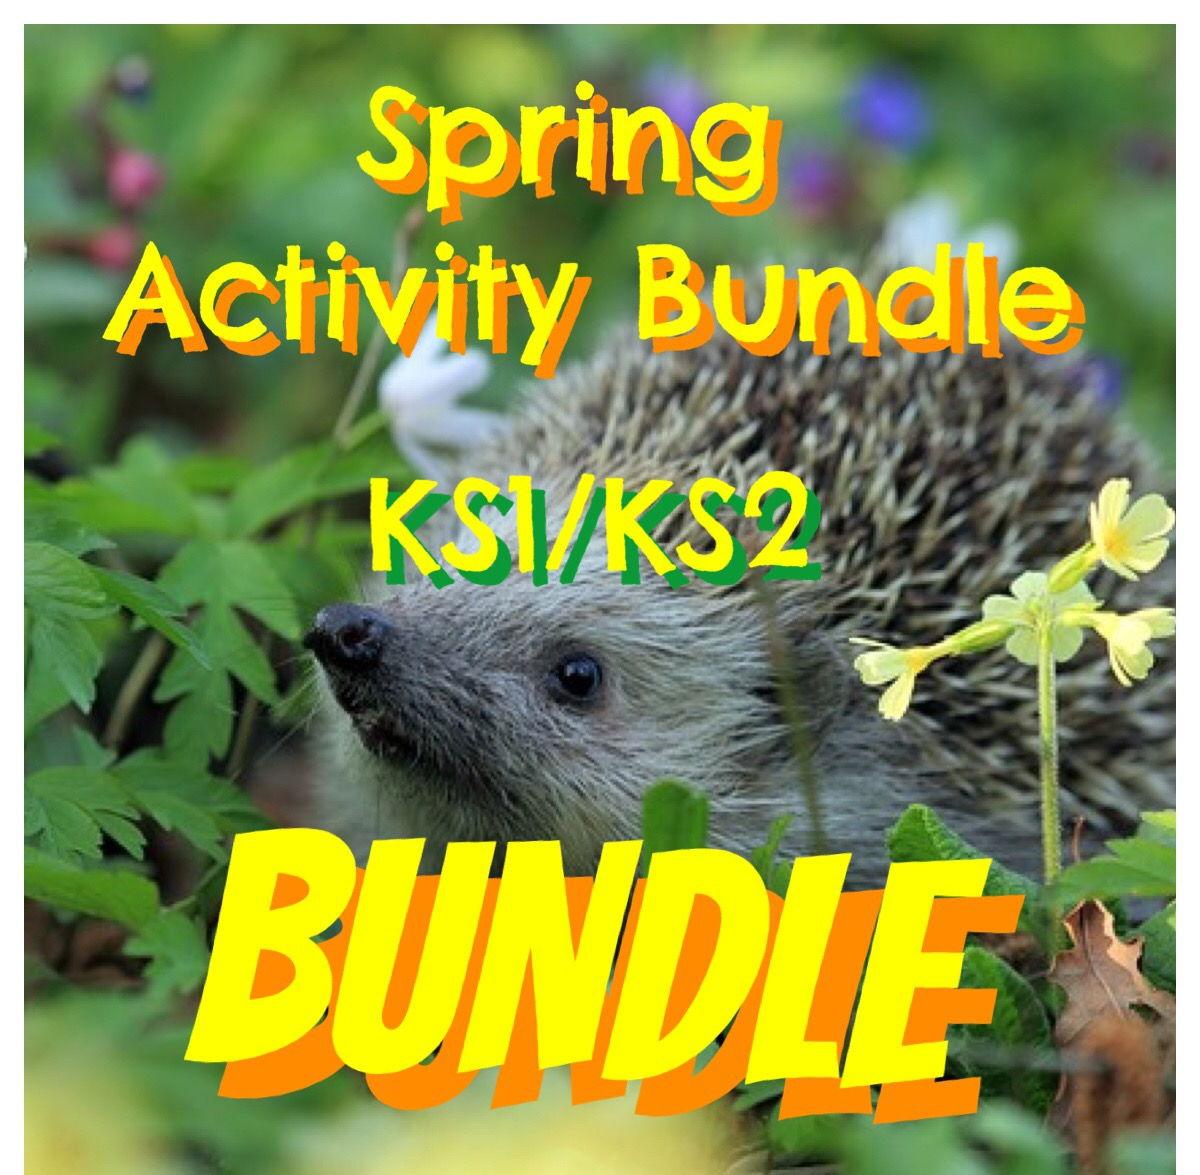 Spring Activity Bundle for KS1/KS2